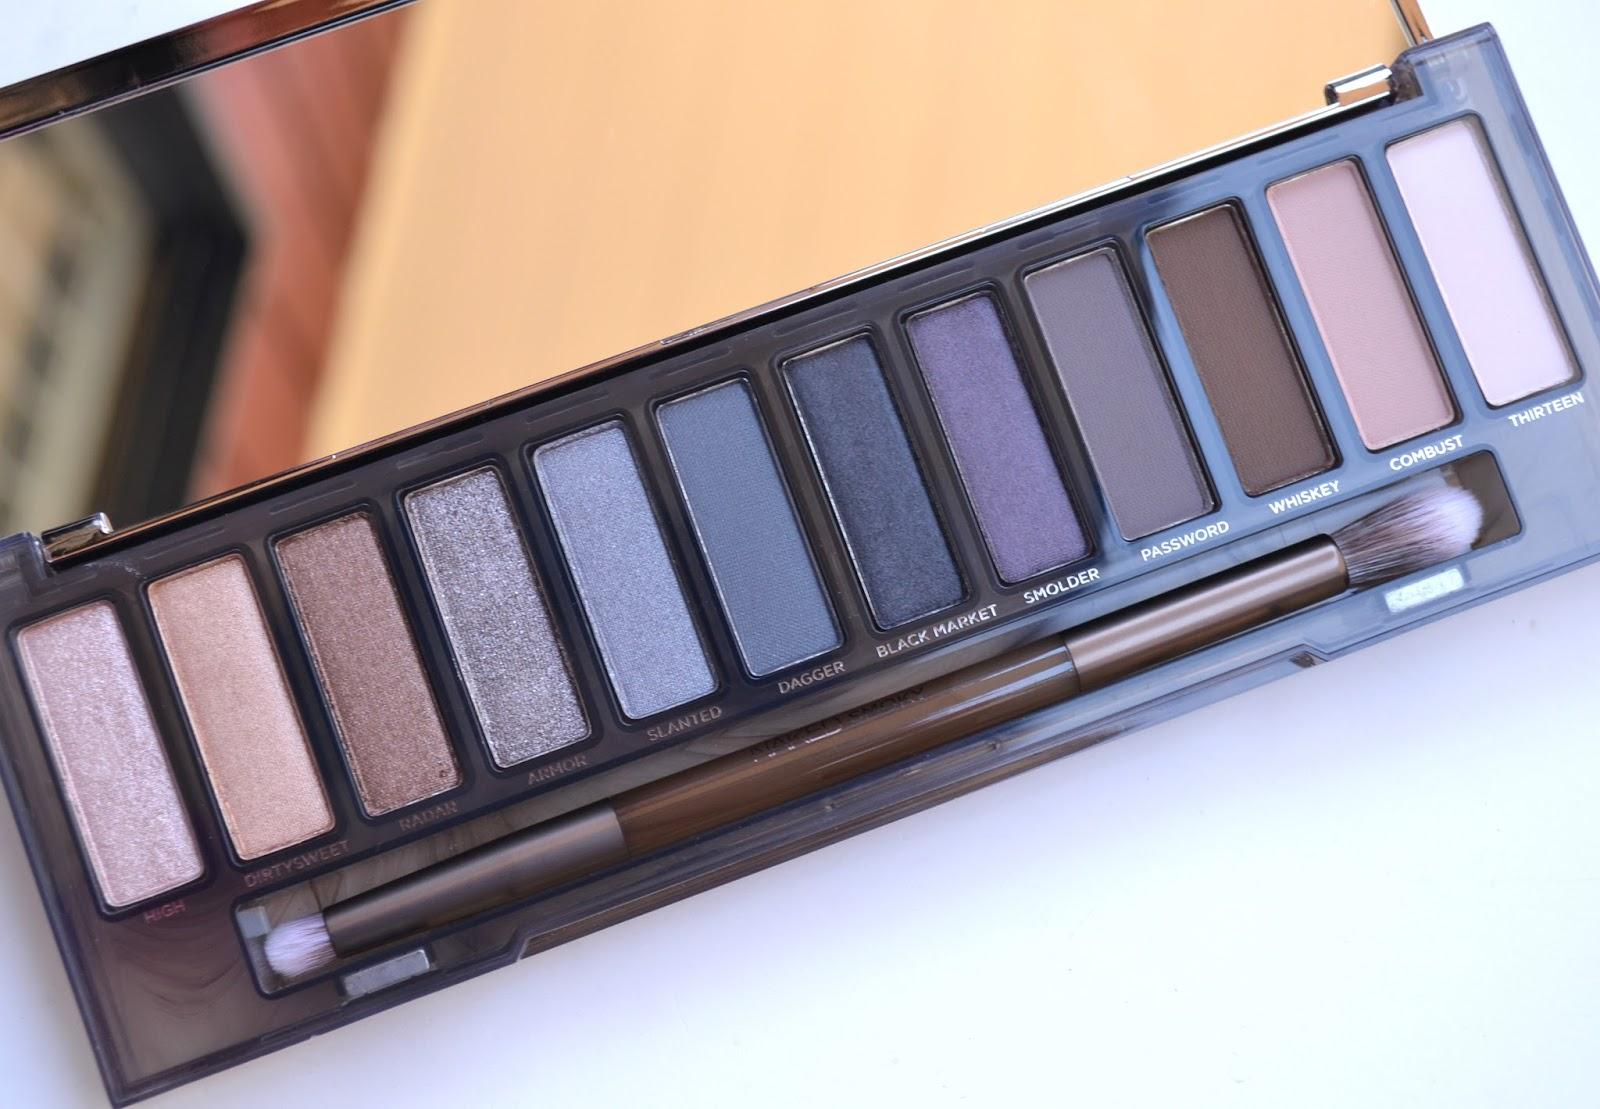 Urban Decay Naked Smoky Eyeshadow Palette | Groupon